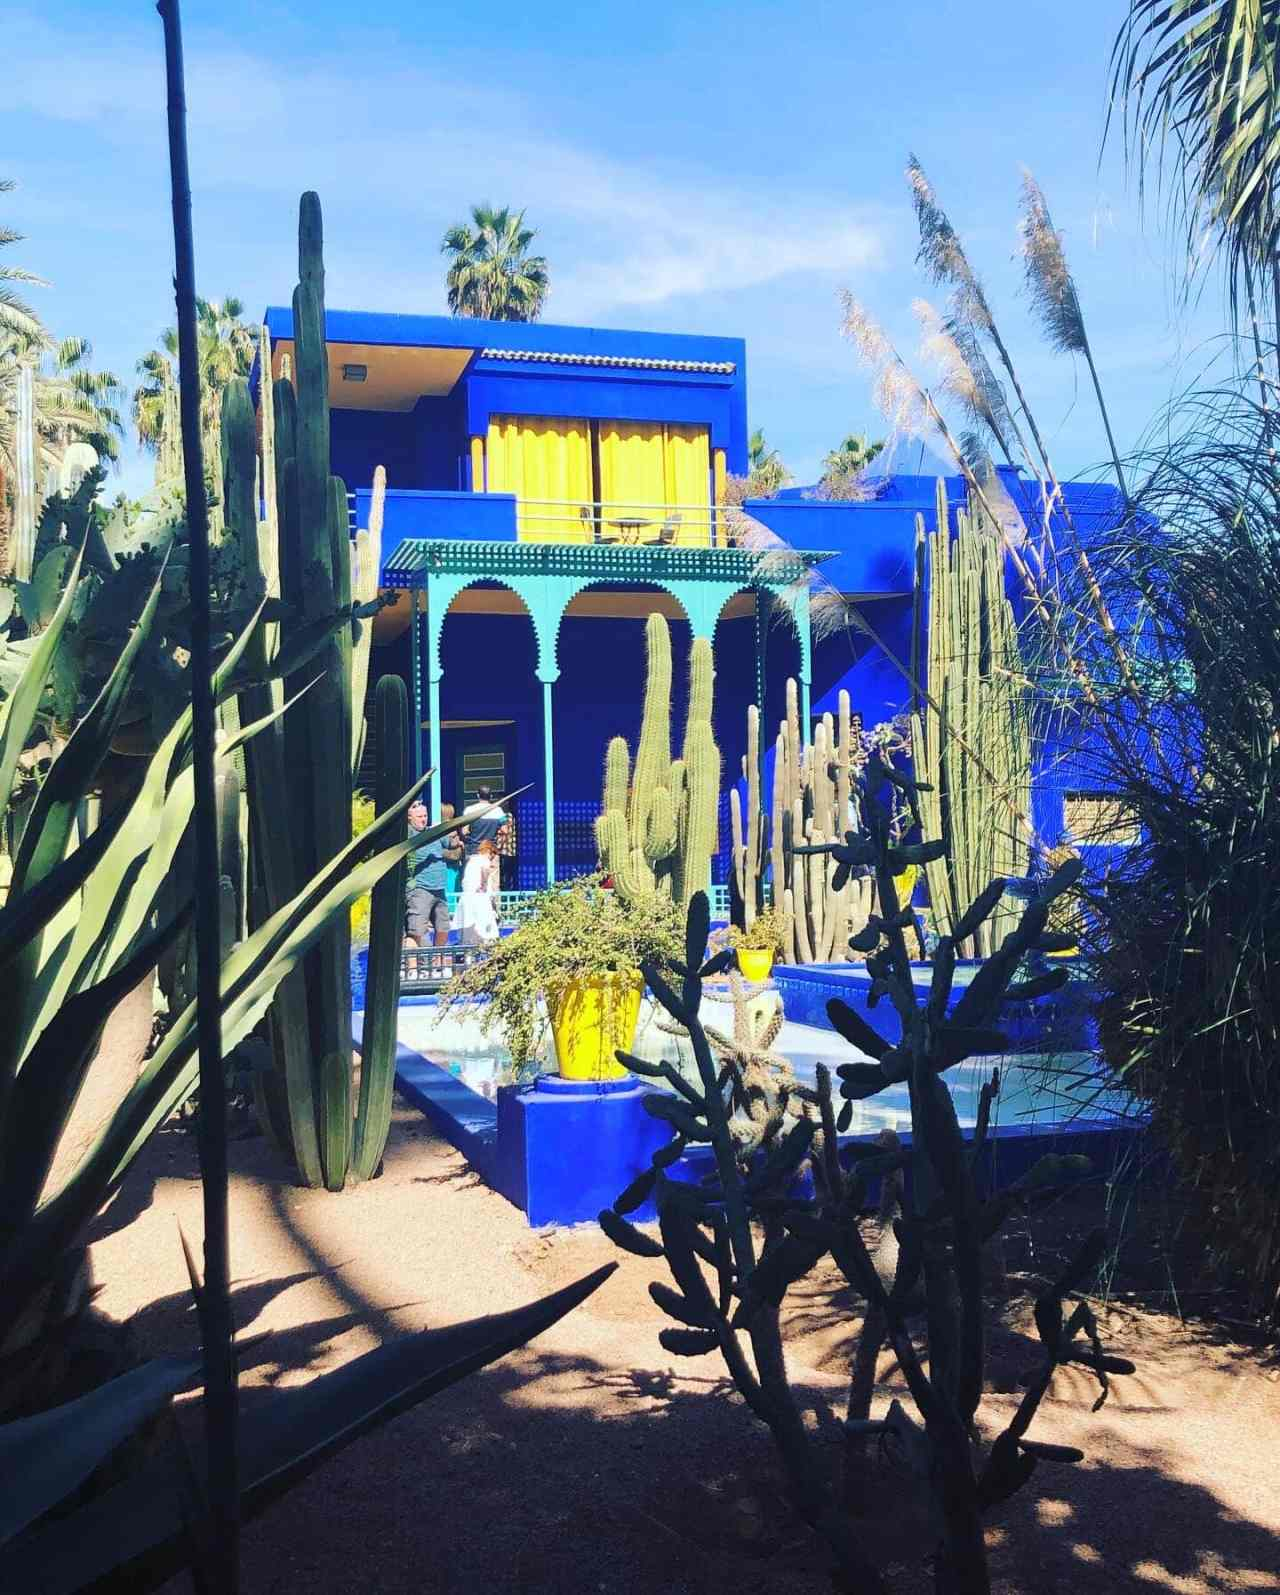 Le Jardin Majorelle house